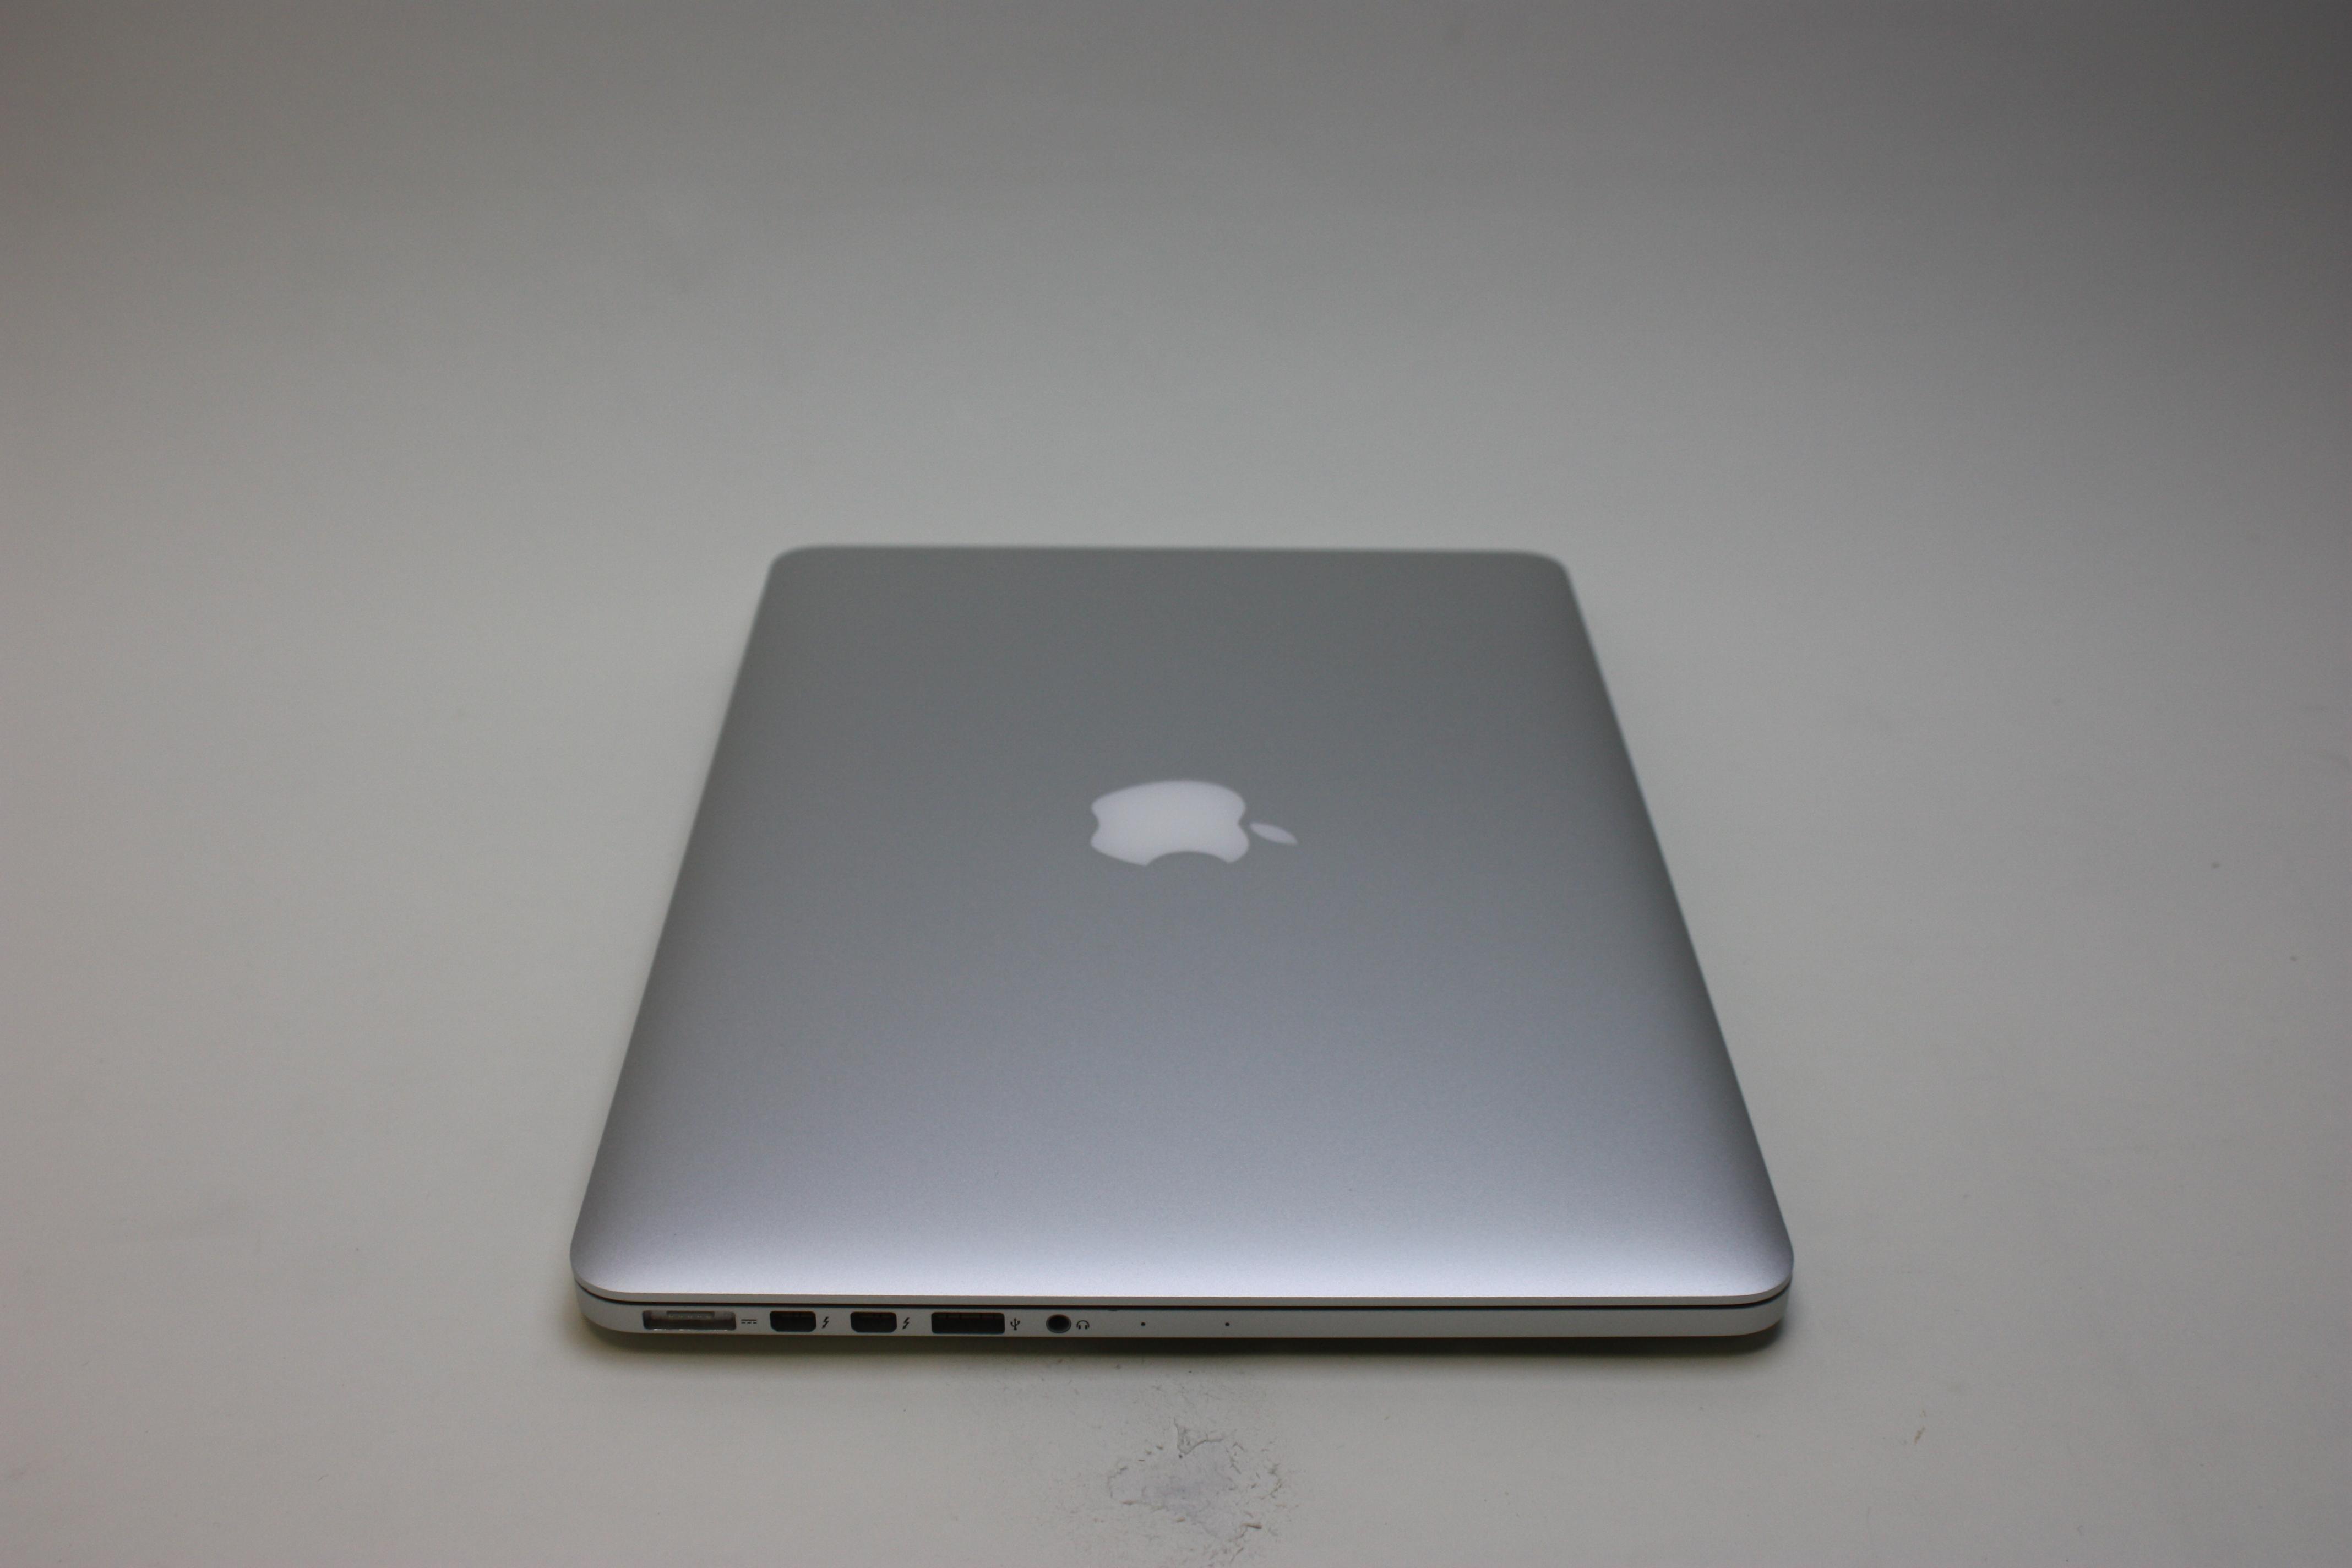 MacBook Pro 13-inch Retina, 2.7 GHz Core i5 (I5-5257U), 8 GB 1867 MHz DDR3, 128 GB Flash Storage, image 5